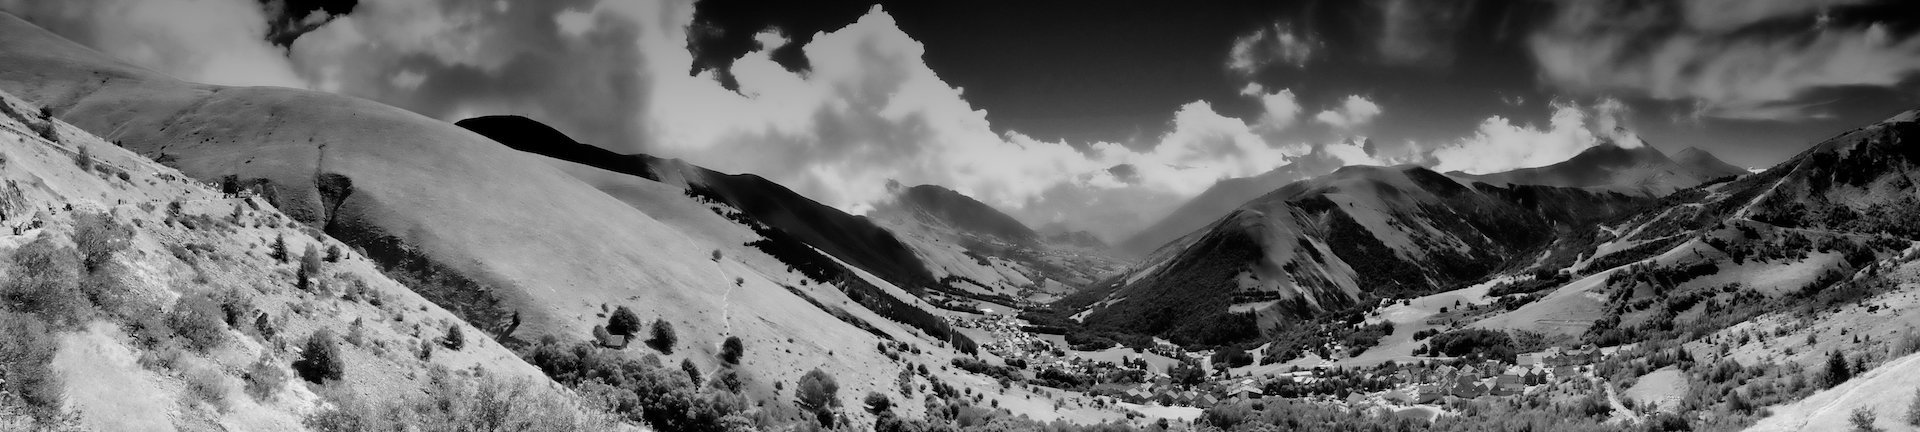 pano vallée de l'Arves.jpg